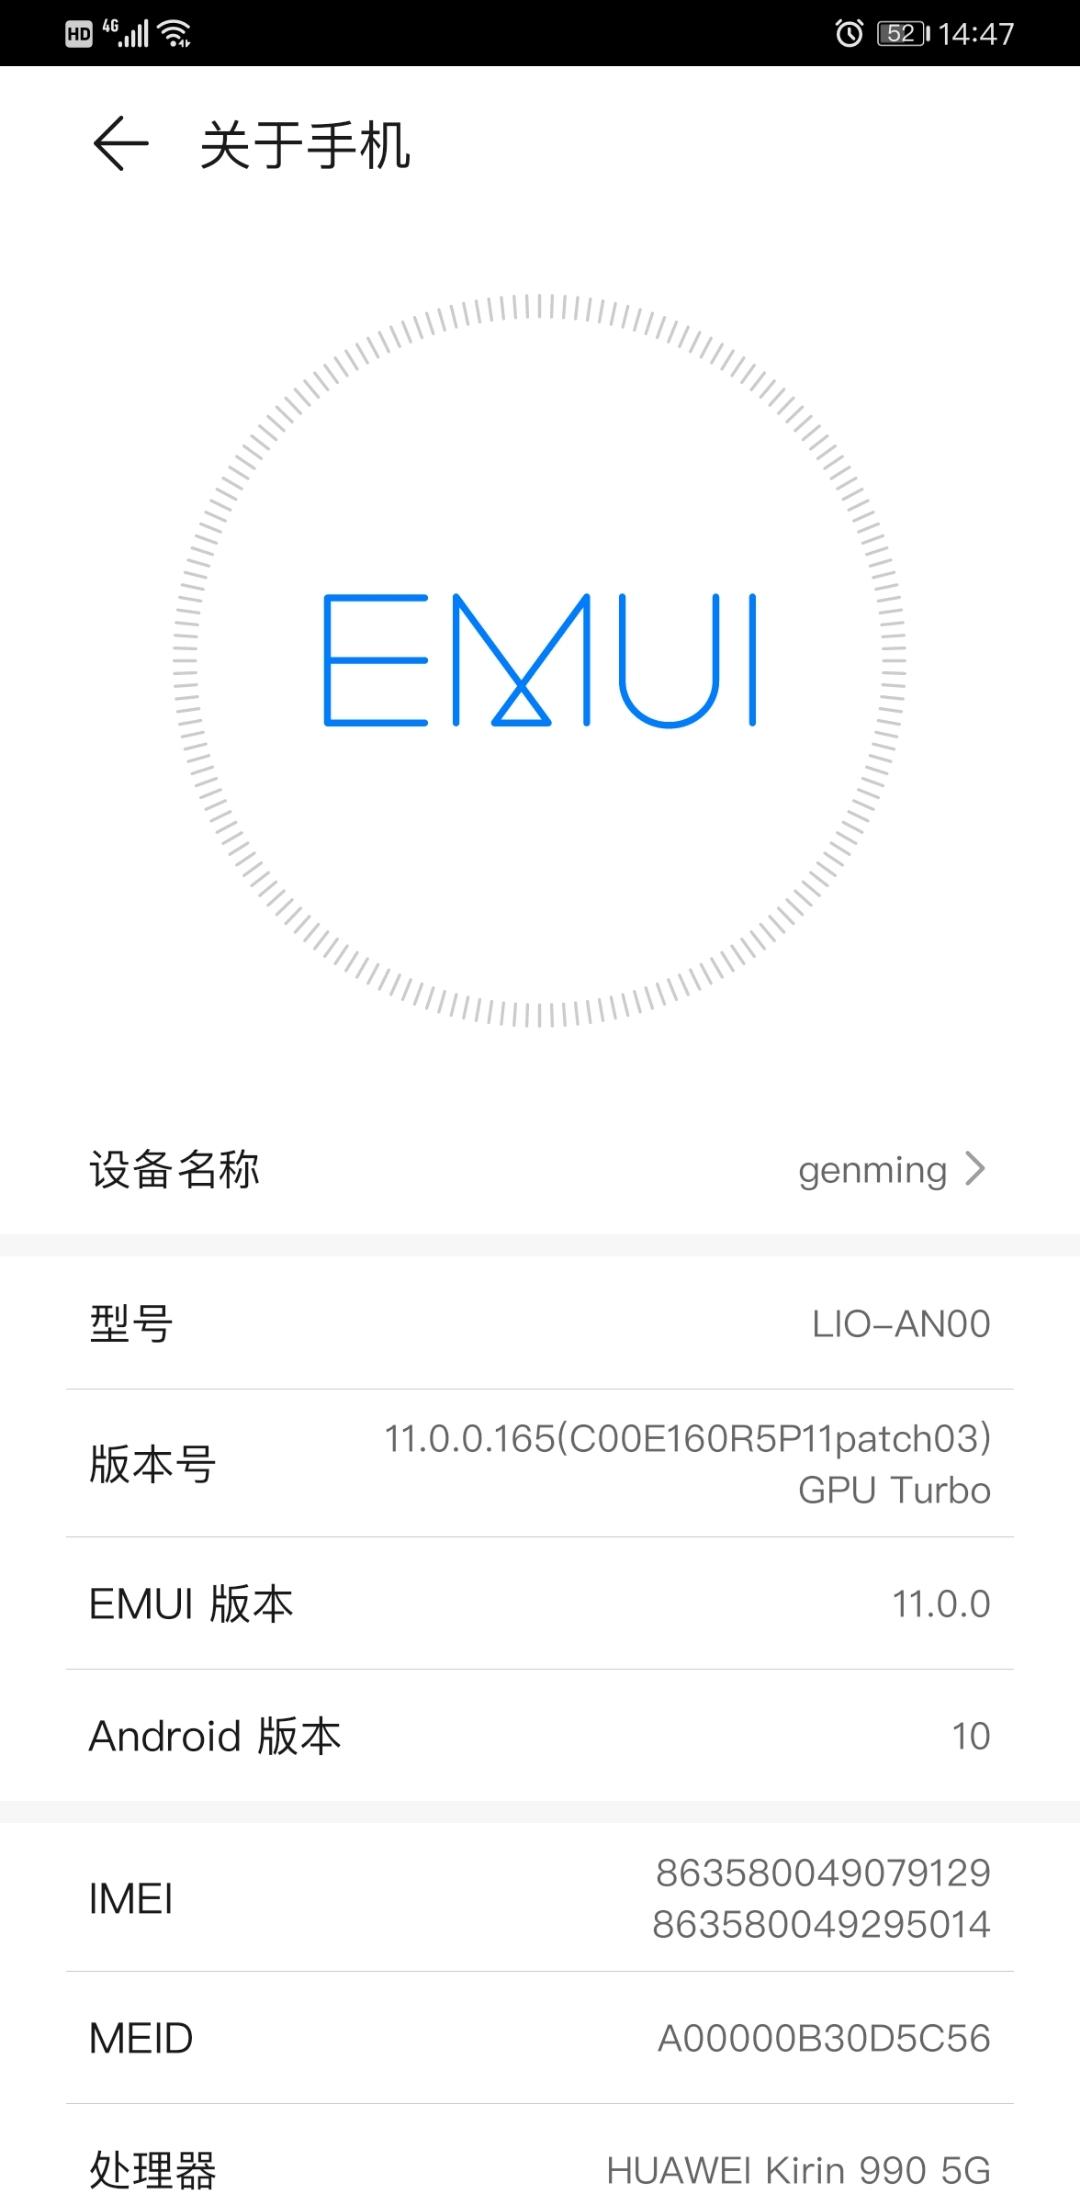 Screenshot_20210120_144723_com.android.settings.jpg